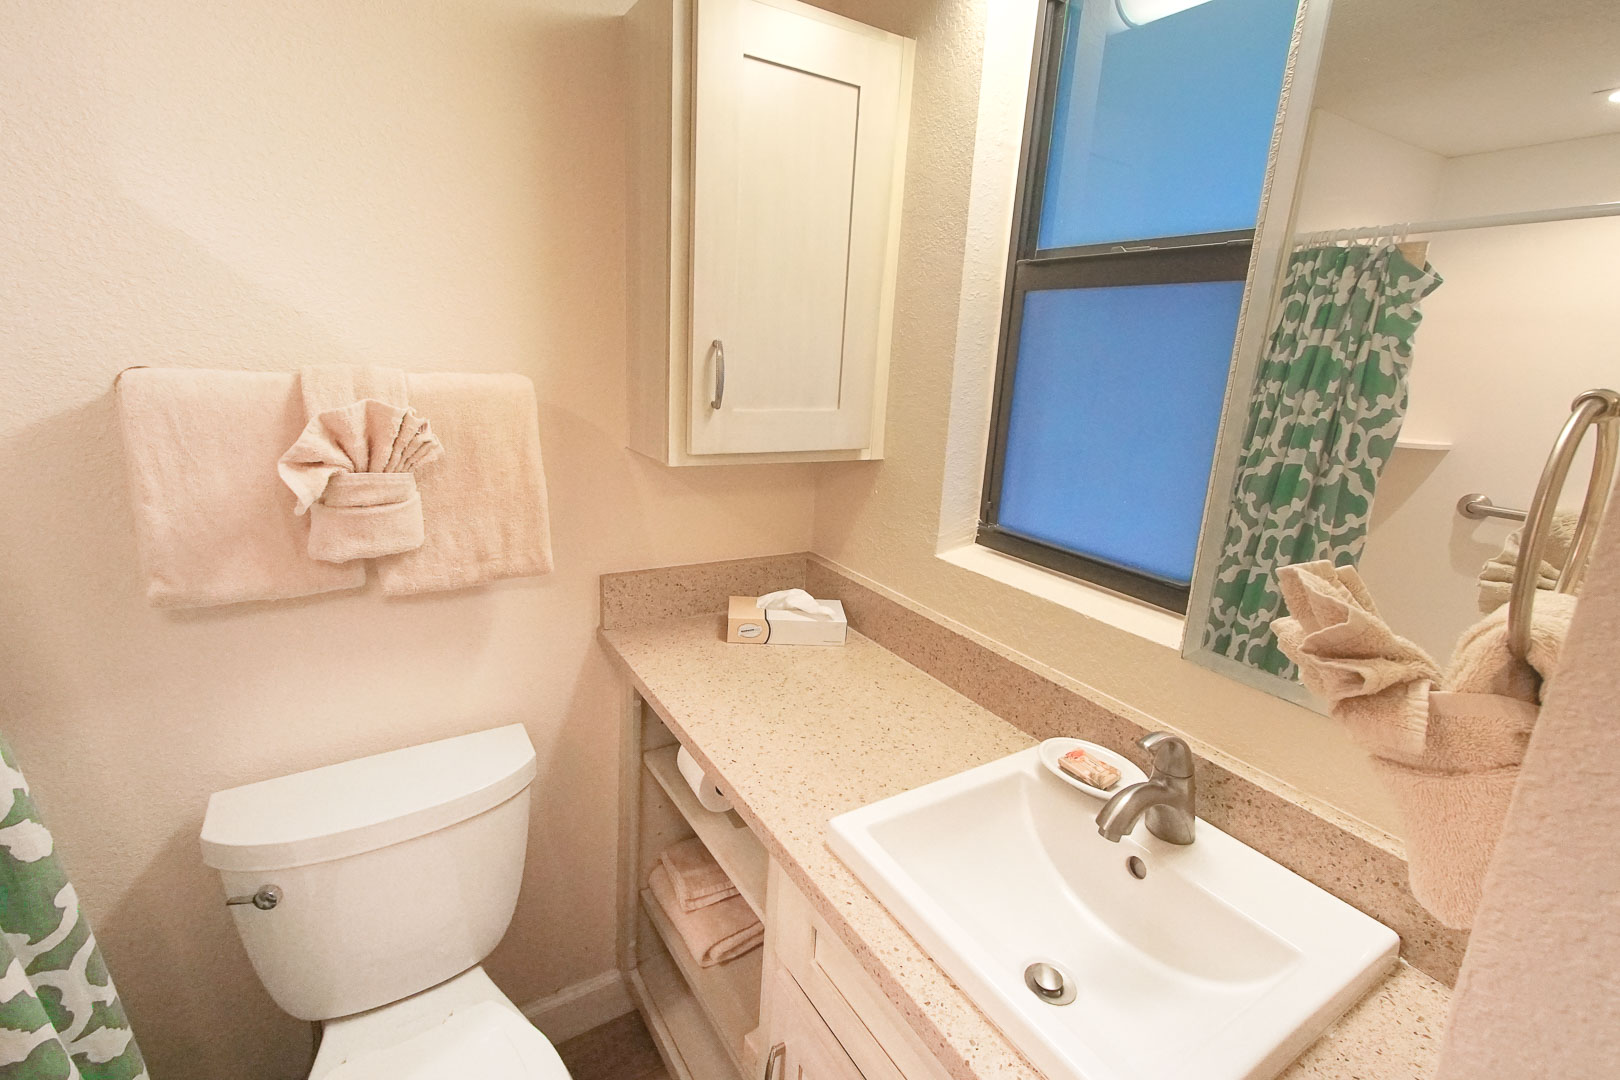 Mariner's Boathouse - Unit Interior - Bathroom